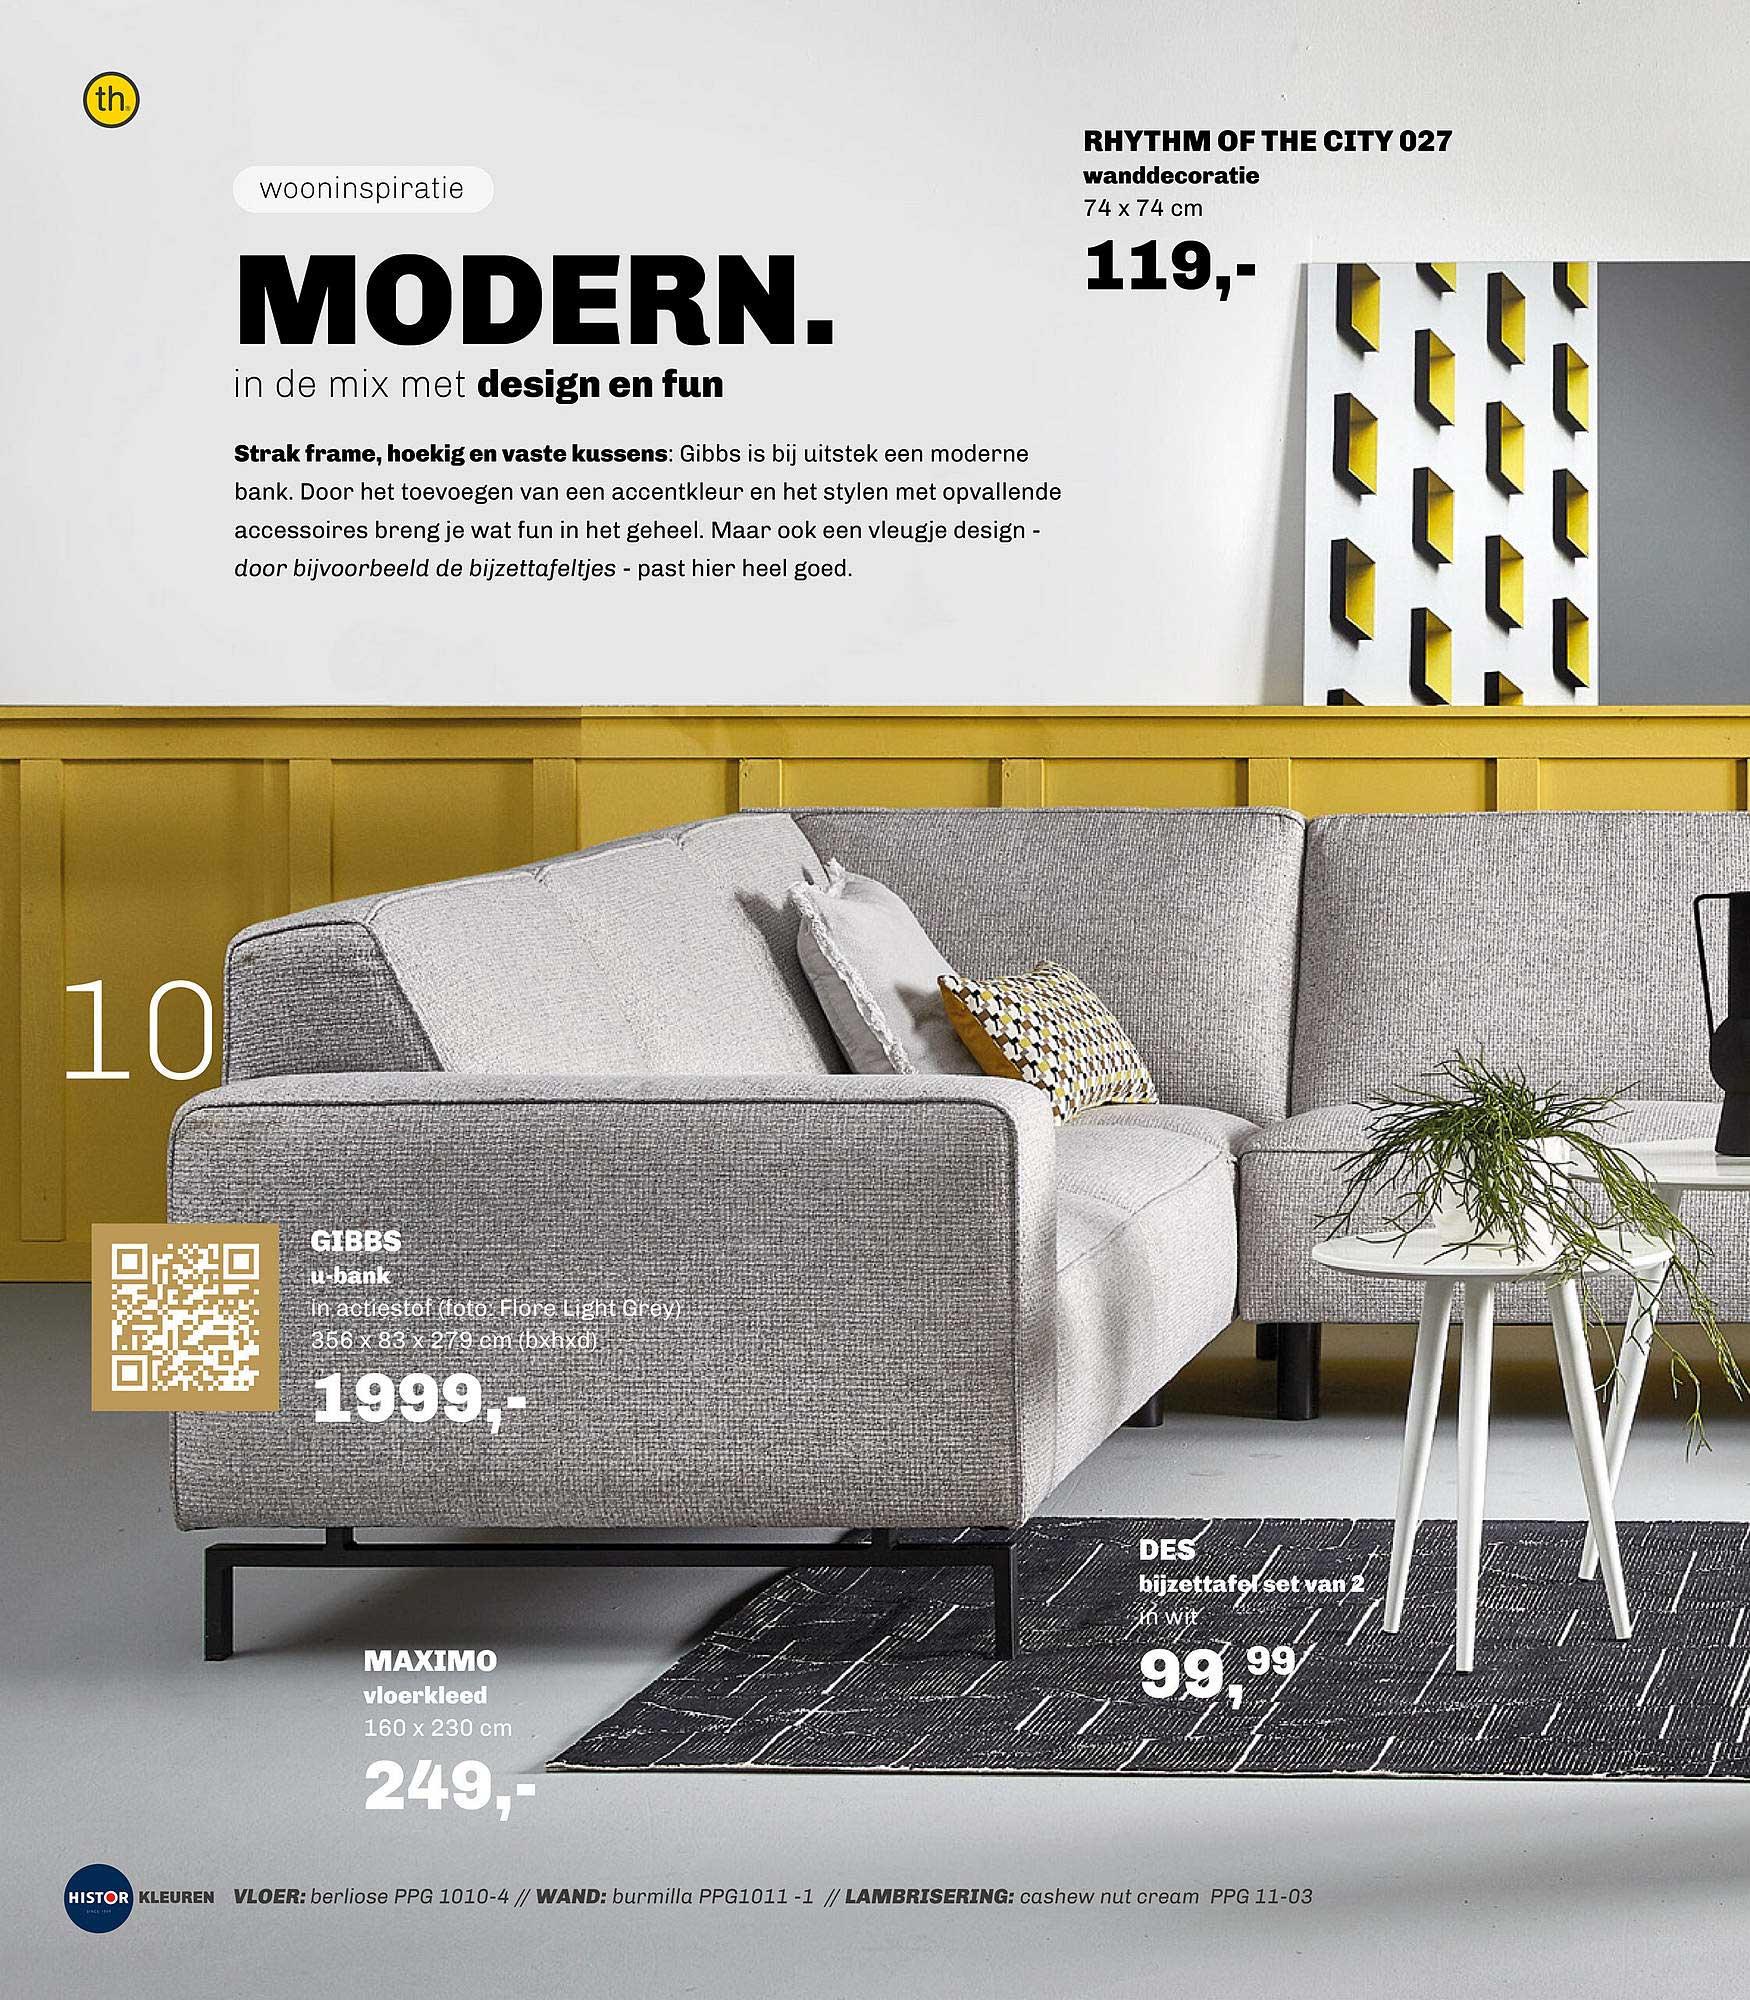 Trendhopper Rhythm Of The City 027 Wanddecoratie, Gibbs U-Bank, Maximo Vloerkleed Of DES Bijzettafel Set Van 2